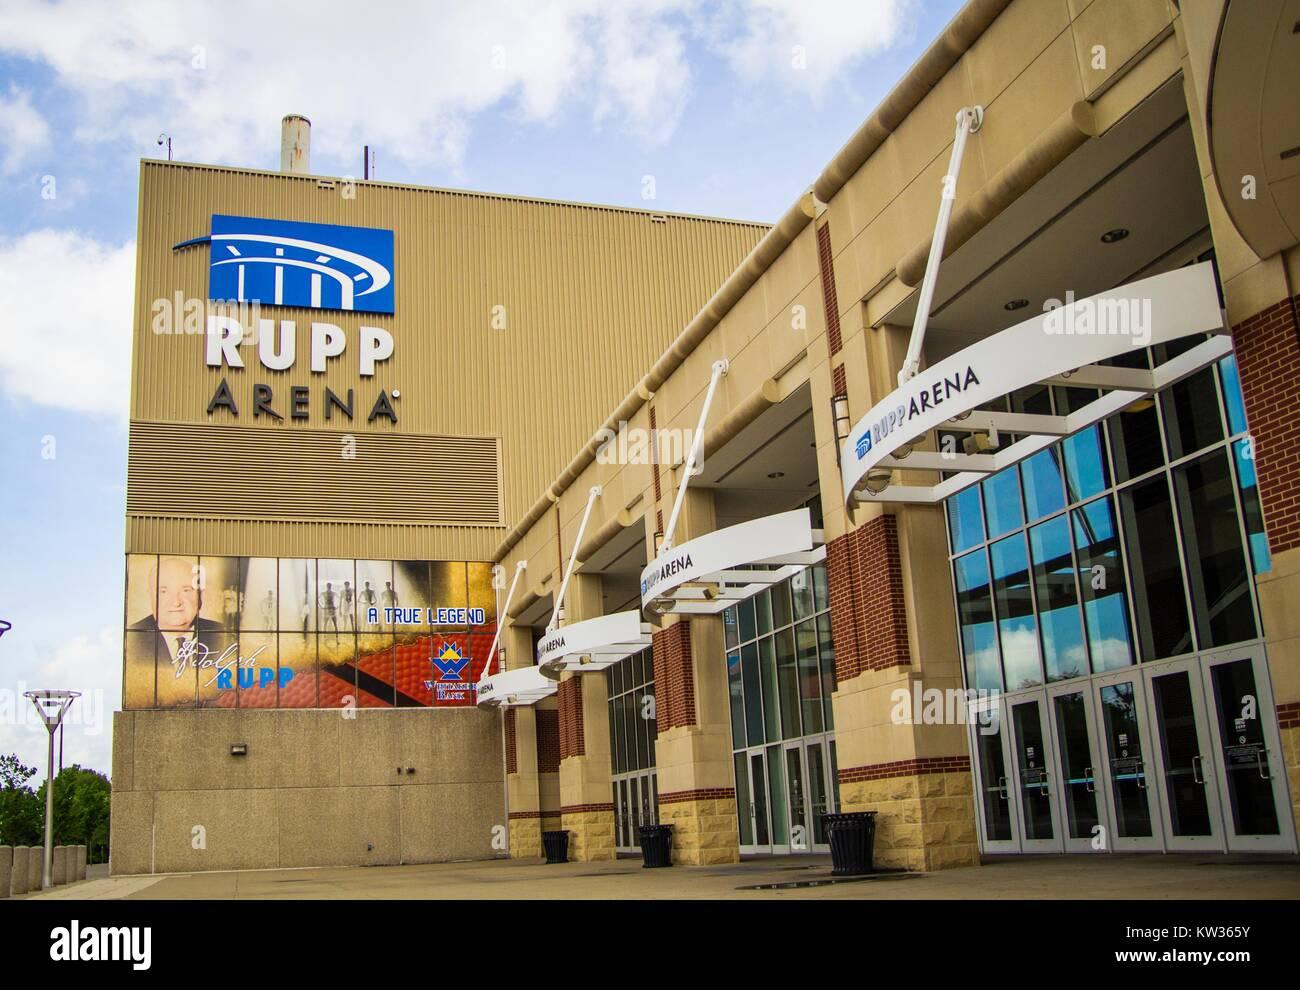 Lexington, Kentucky. USA. June 1, 2015. Rupp Arena in Lexington, Kentucky is home court of the beloved University - Stock Image